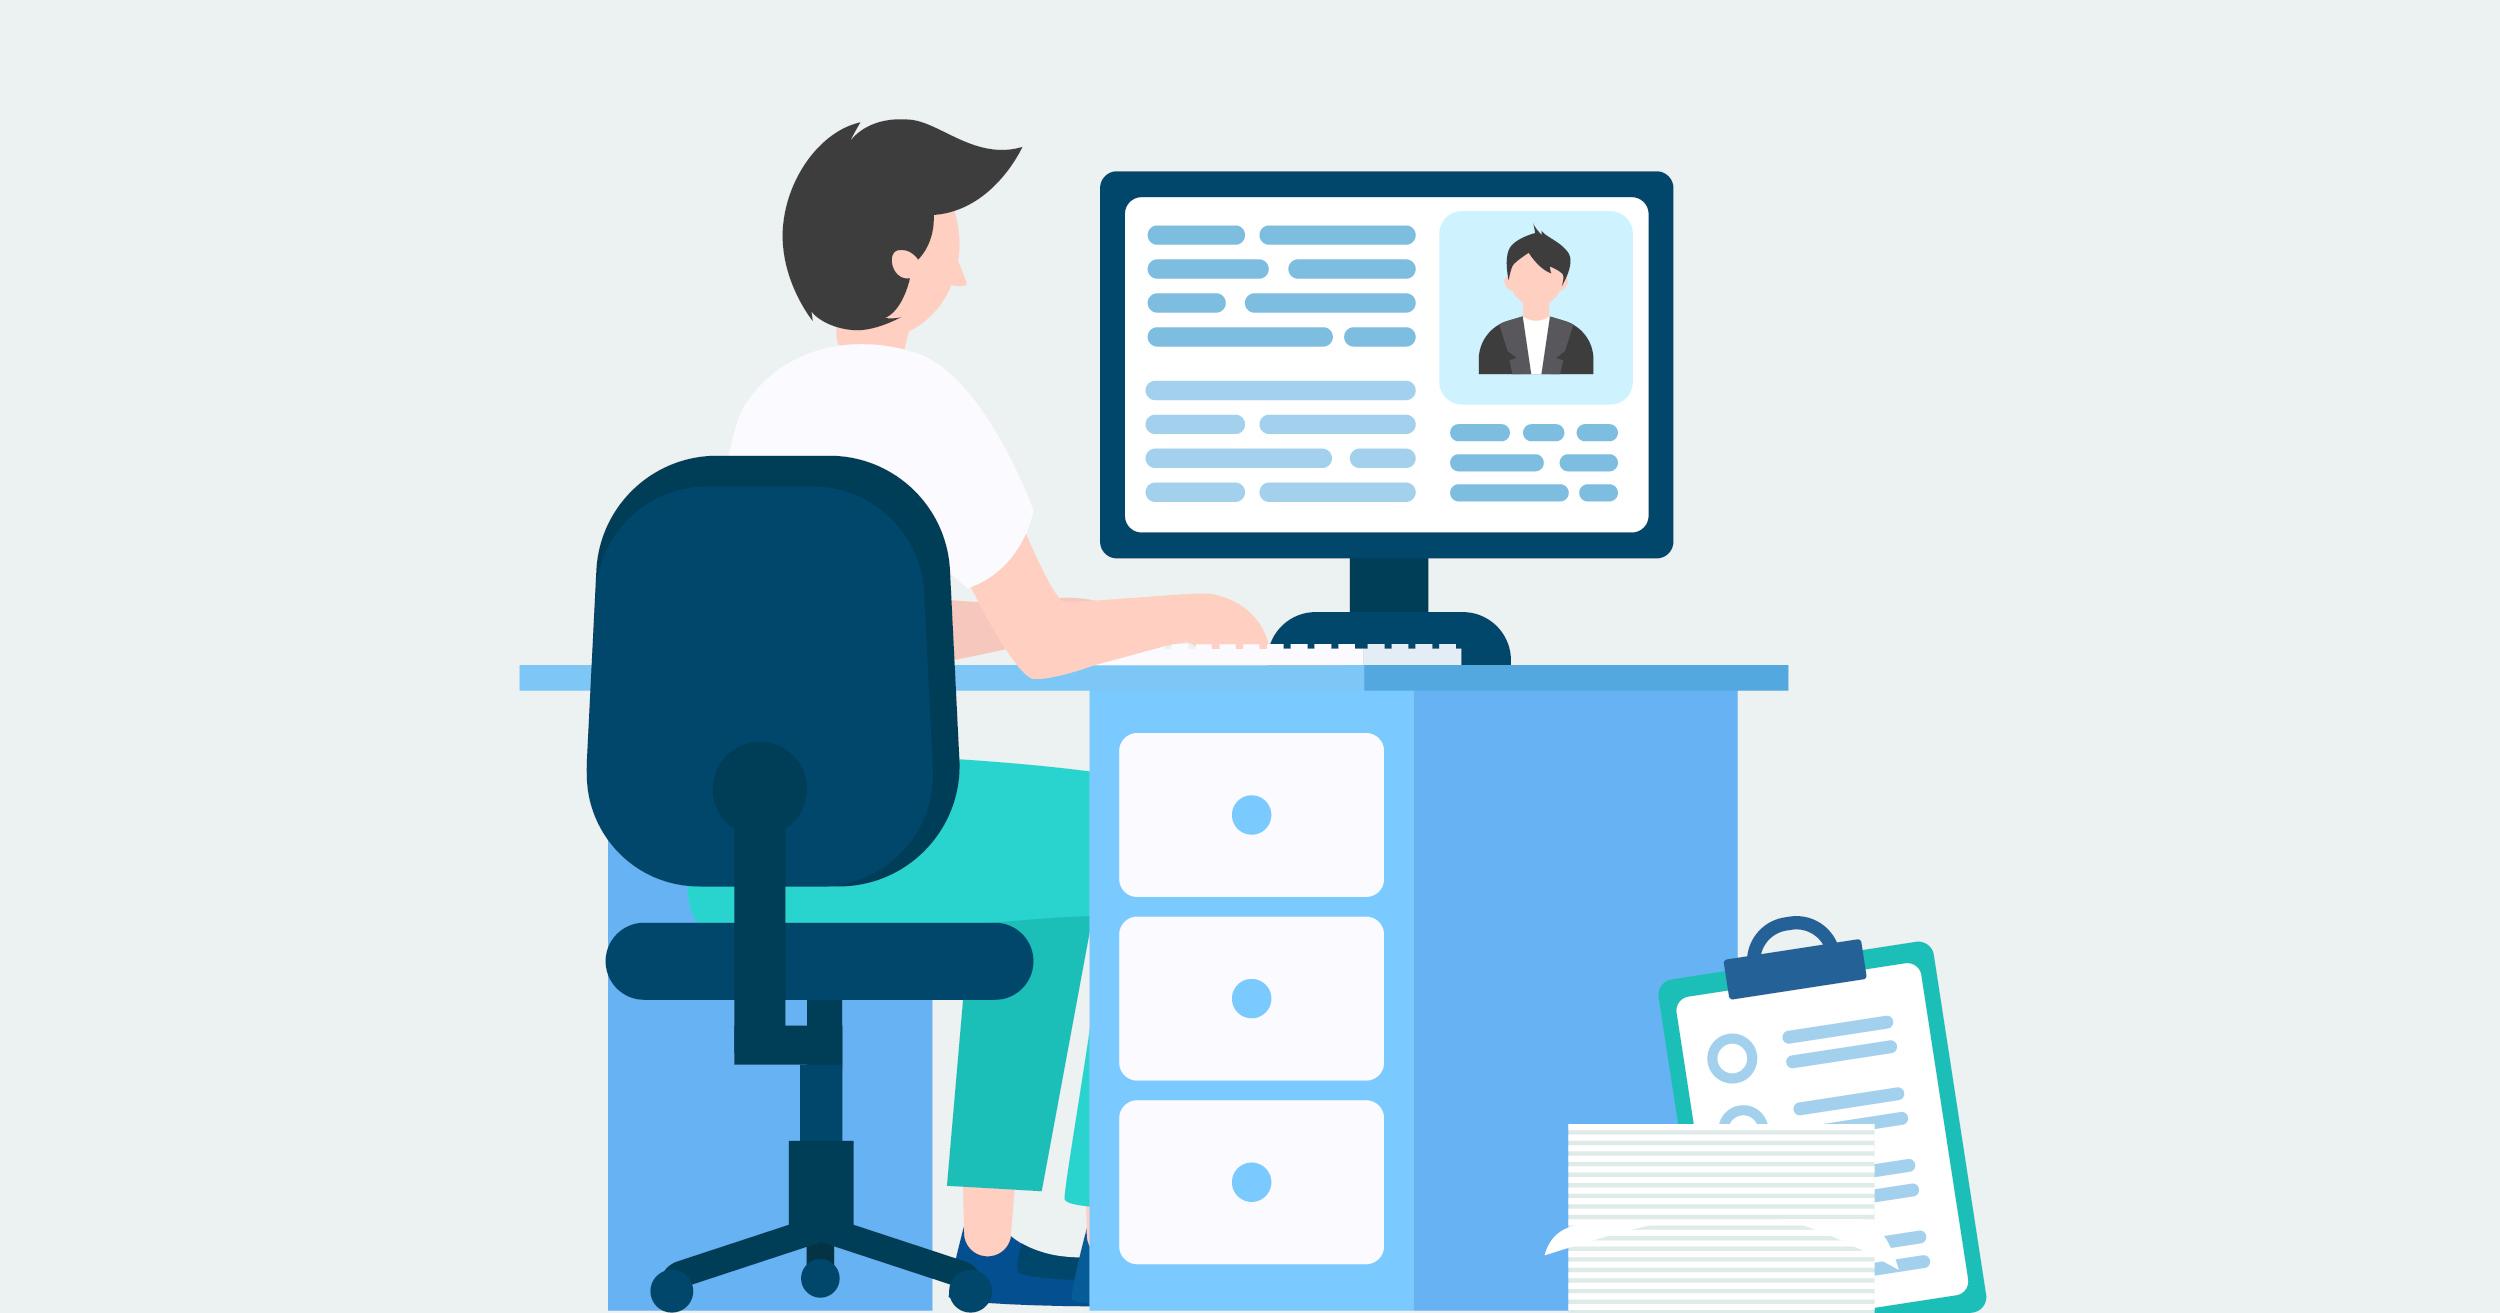 How to Write a Good CV in 2020 (15+ CV Tips)